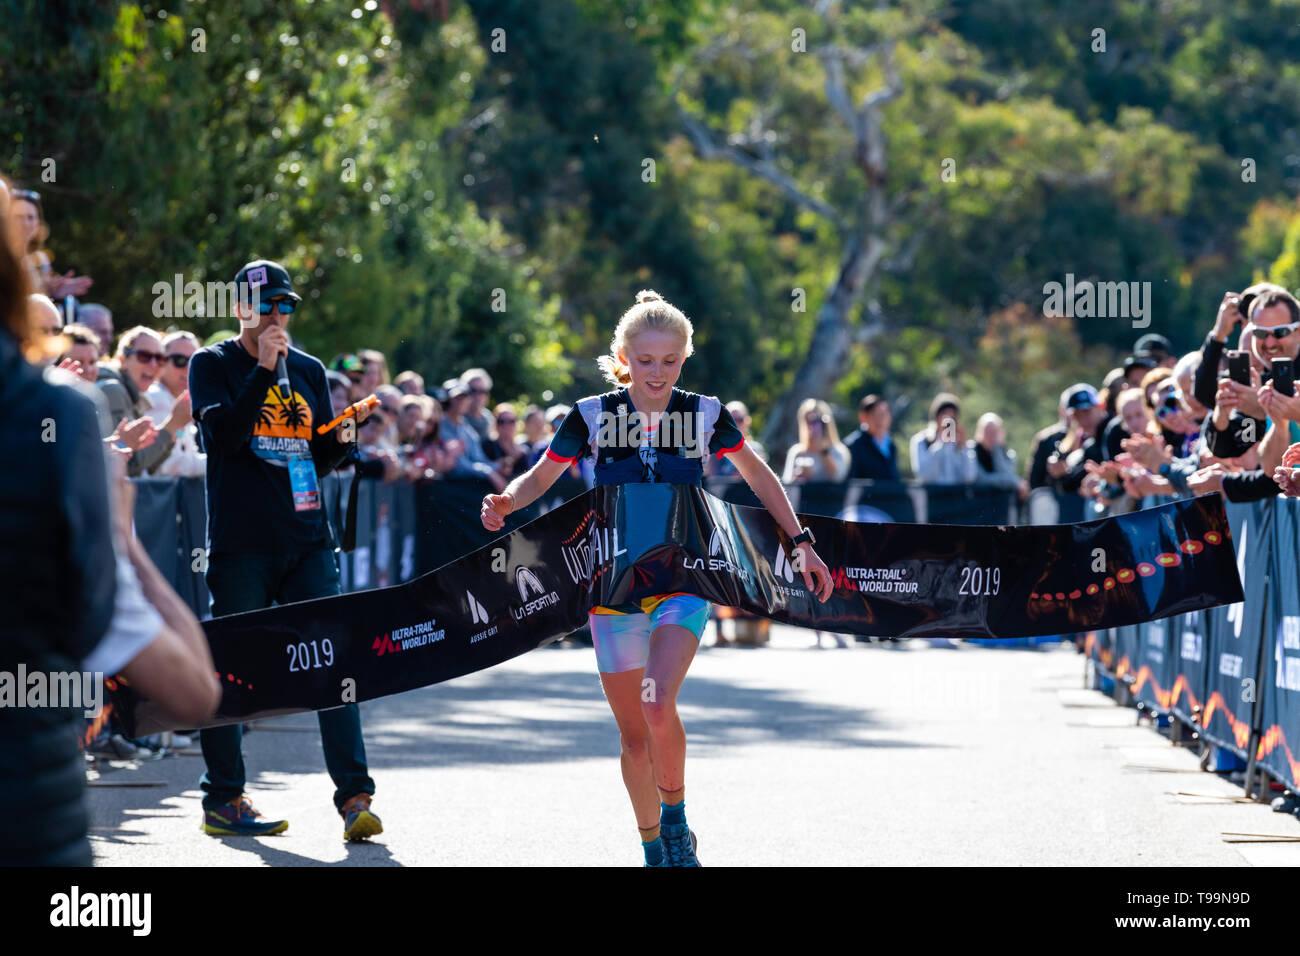 Blue Mountains, Australia - April 16 2019: Ultra-Trail Australia UTA11 race. Runner Paige Penrose, winner of the womens event, crosses the finish tape - Stock Image